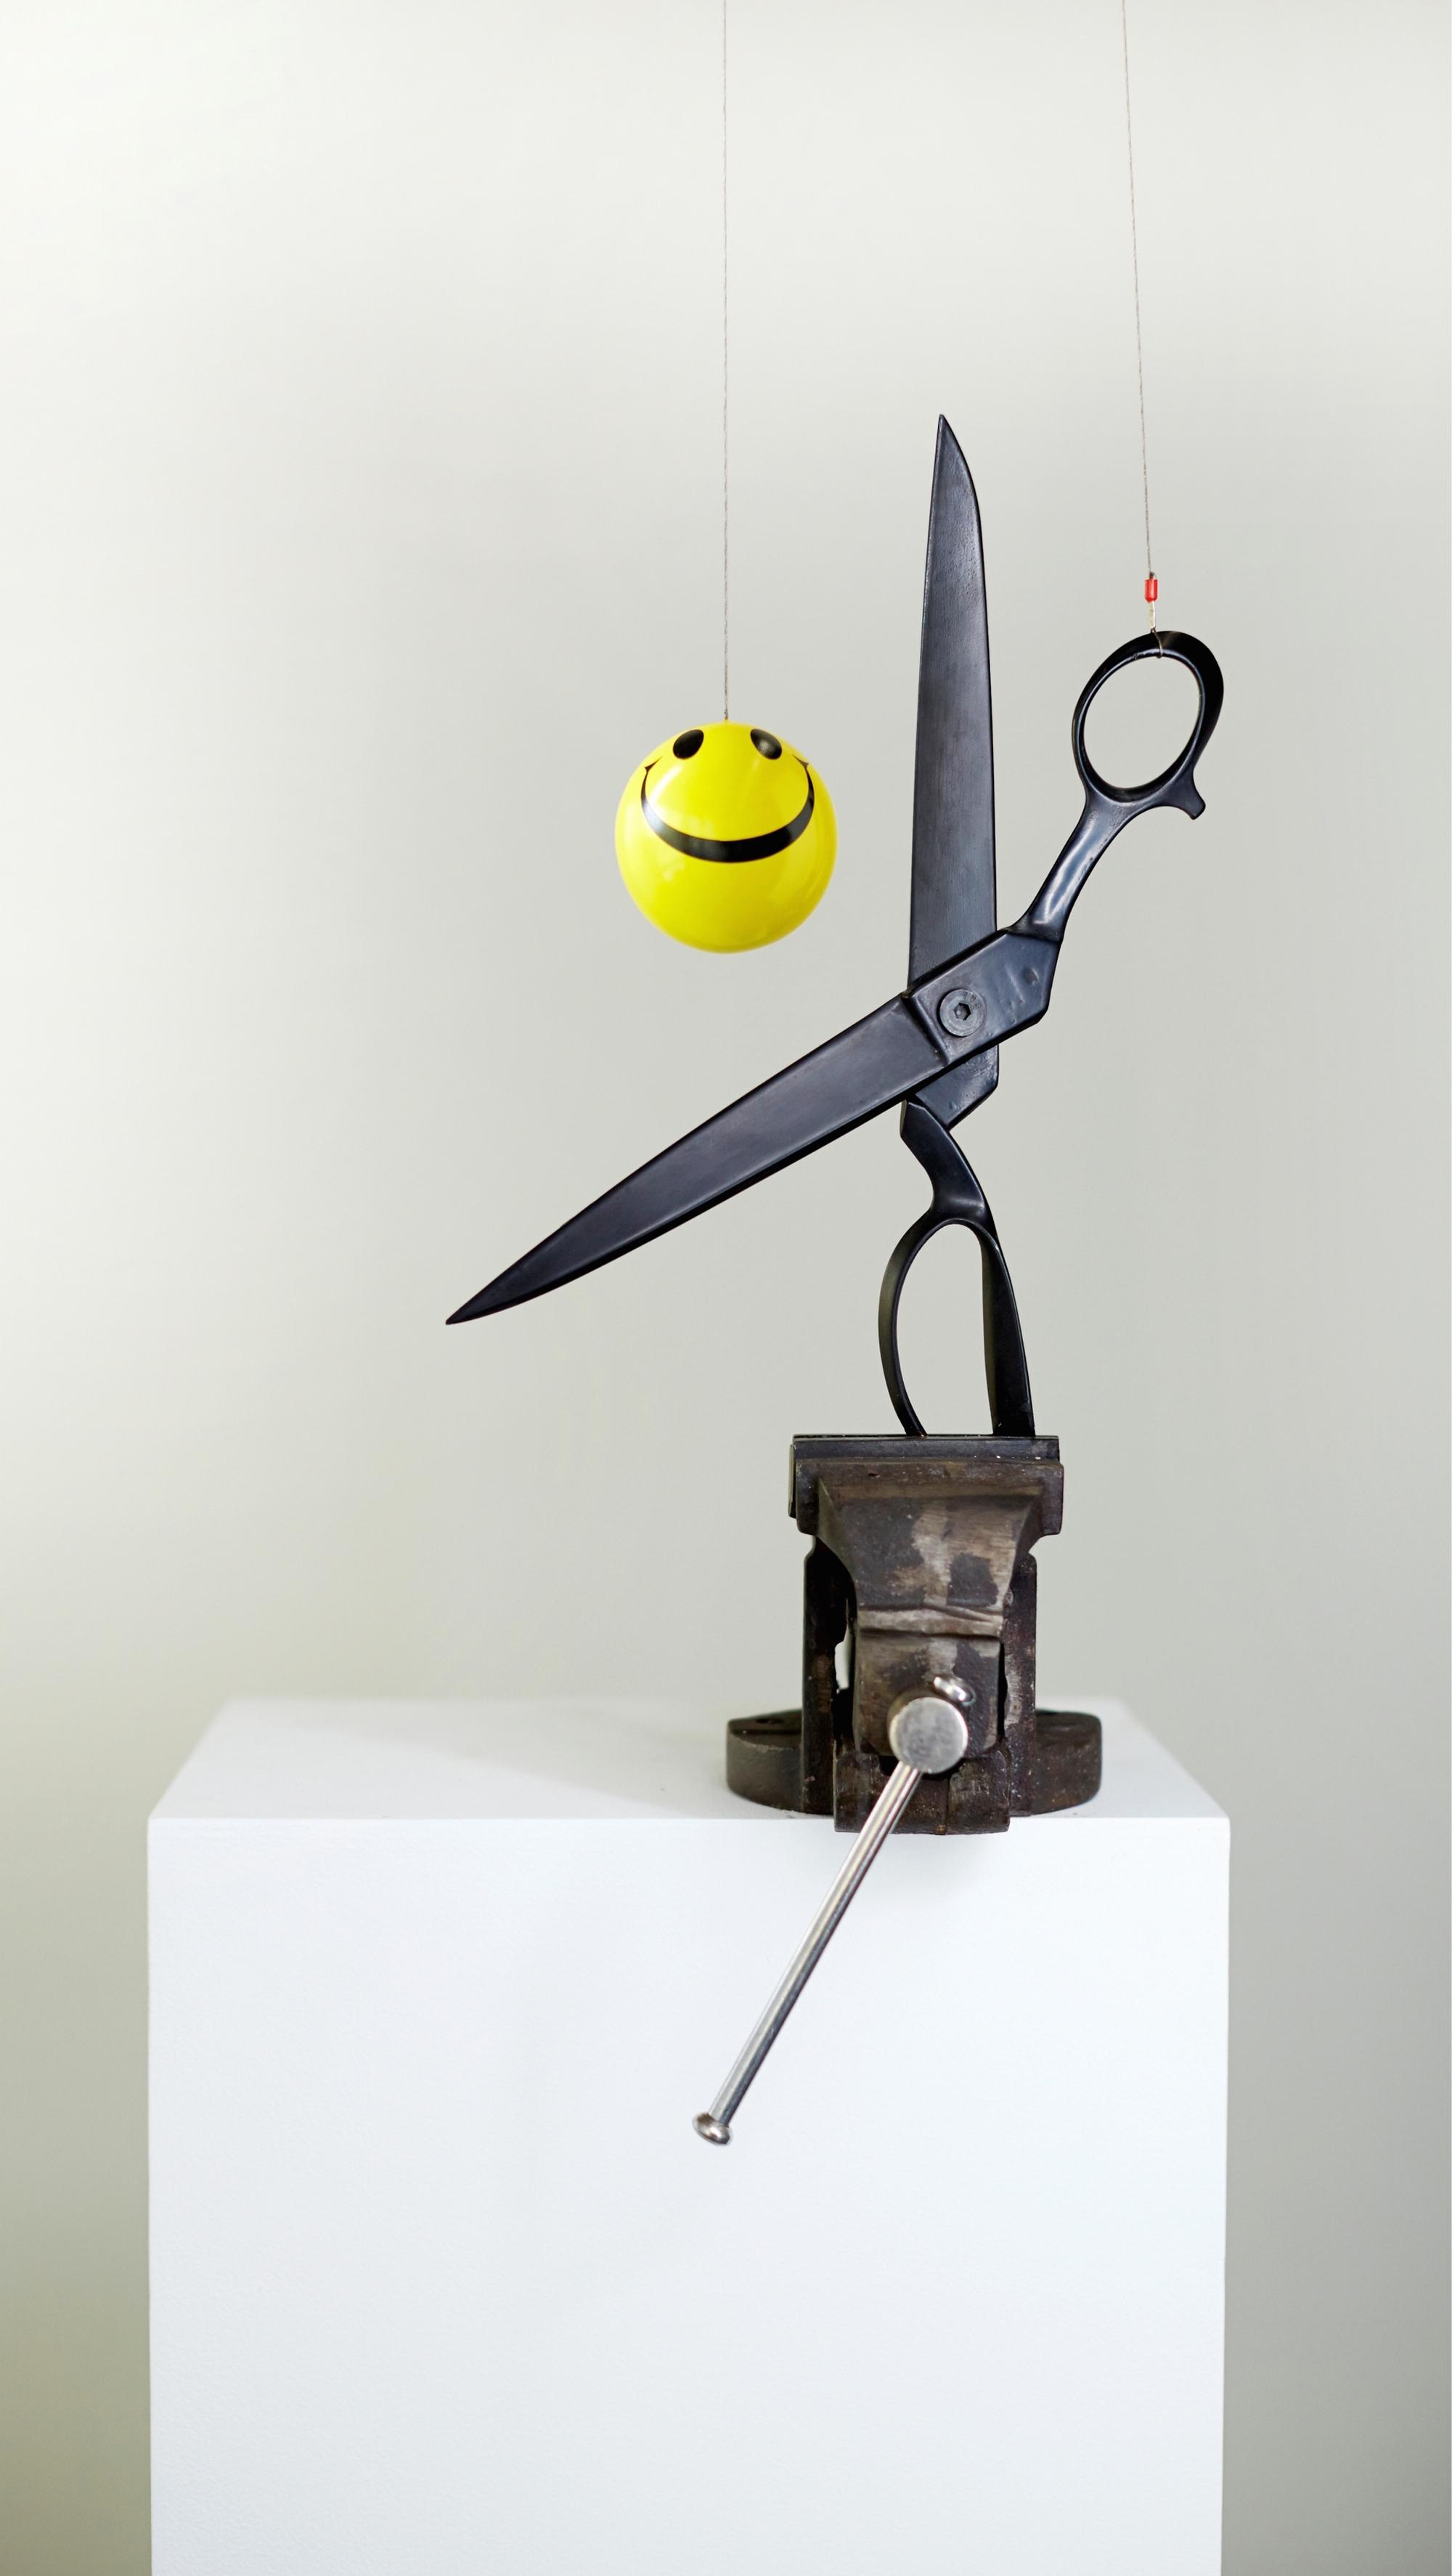 Sunil Gawde-id-od-14- (smiley and scissors)2.jpg